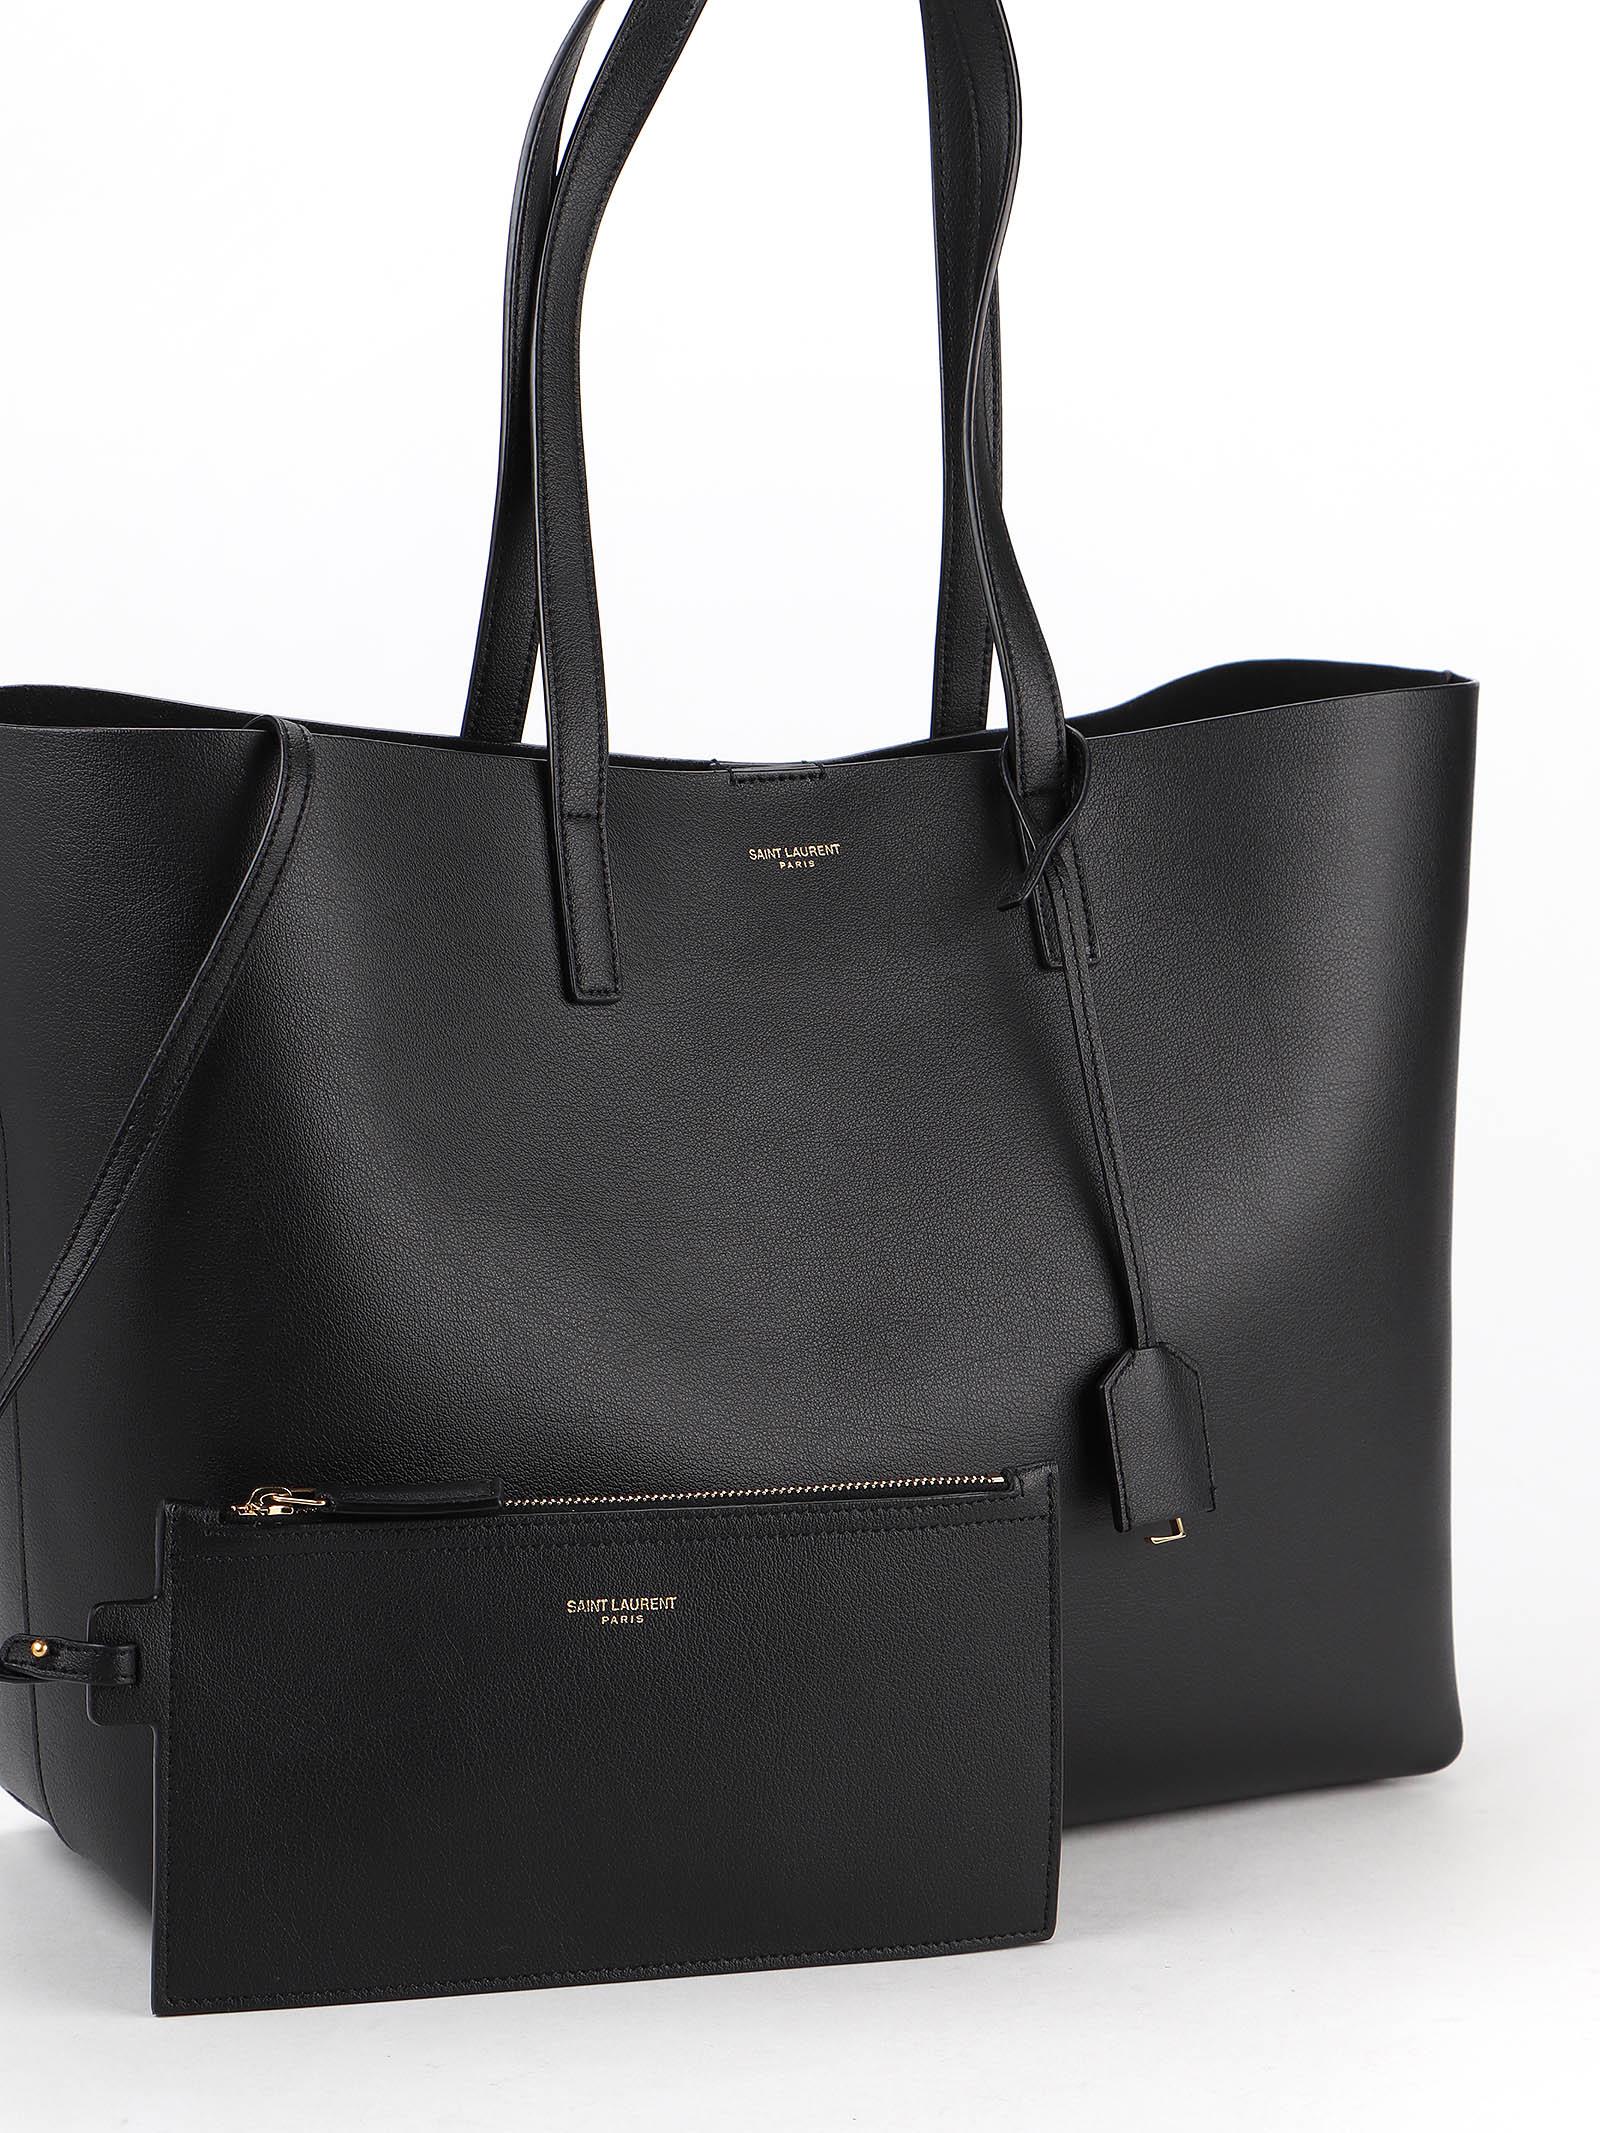 Immagine di Saint Laurent   Ysl Bag Shopping Ew